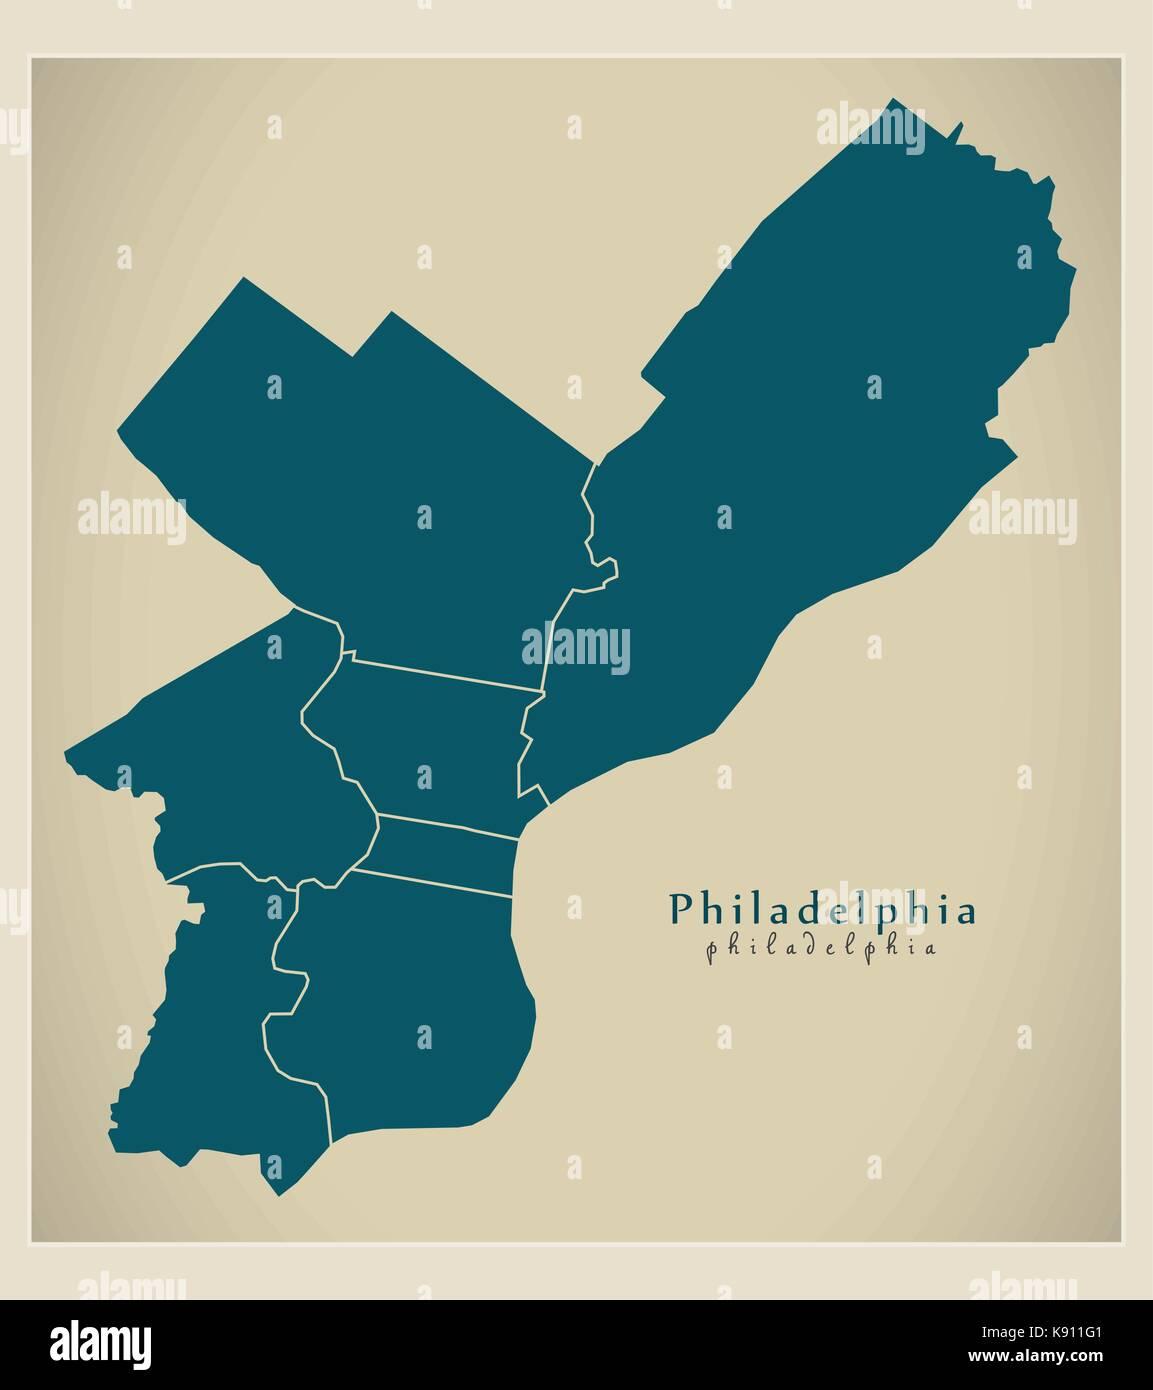 Modern City Map Philadelphia City Of The USA With Boroughs Stock - Philadelphia usa map